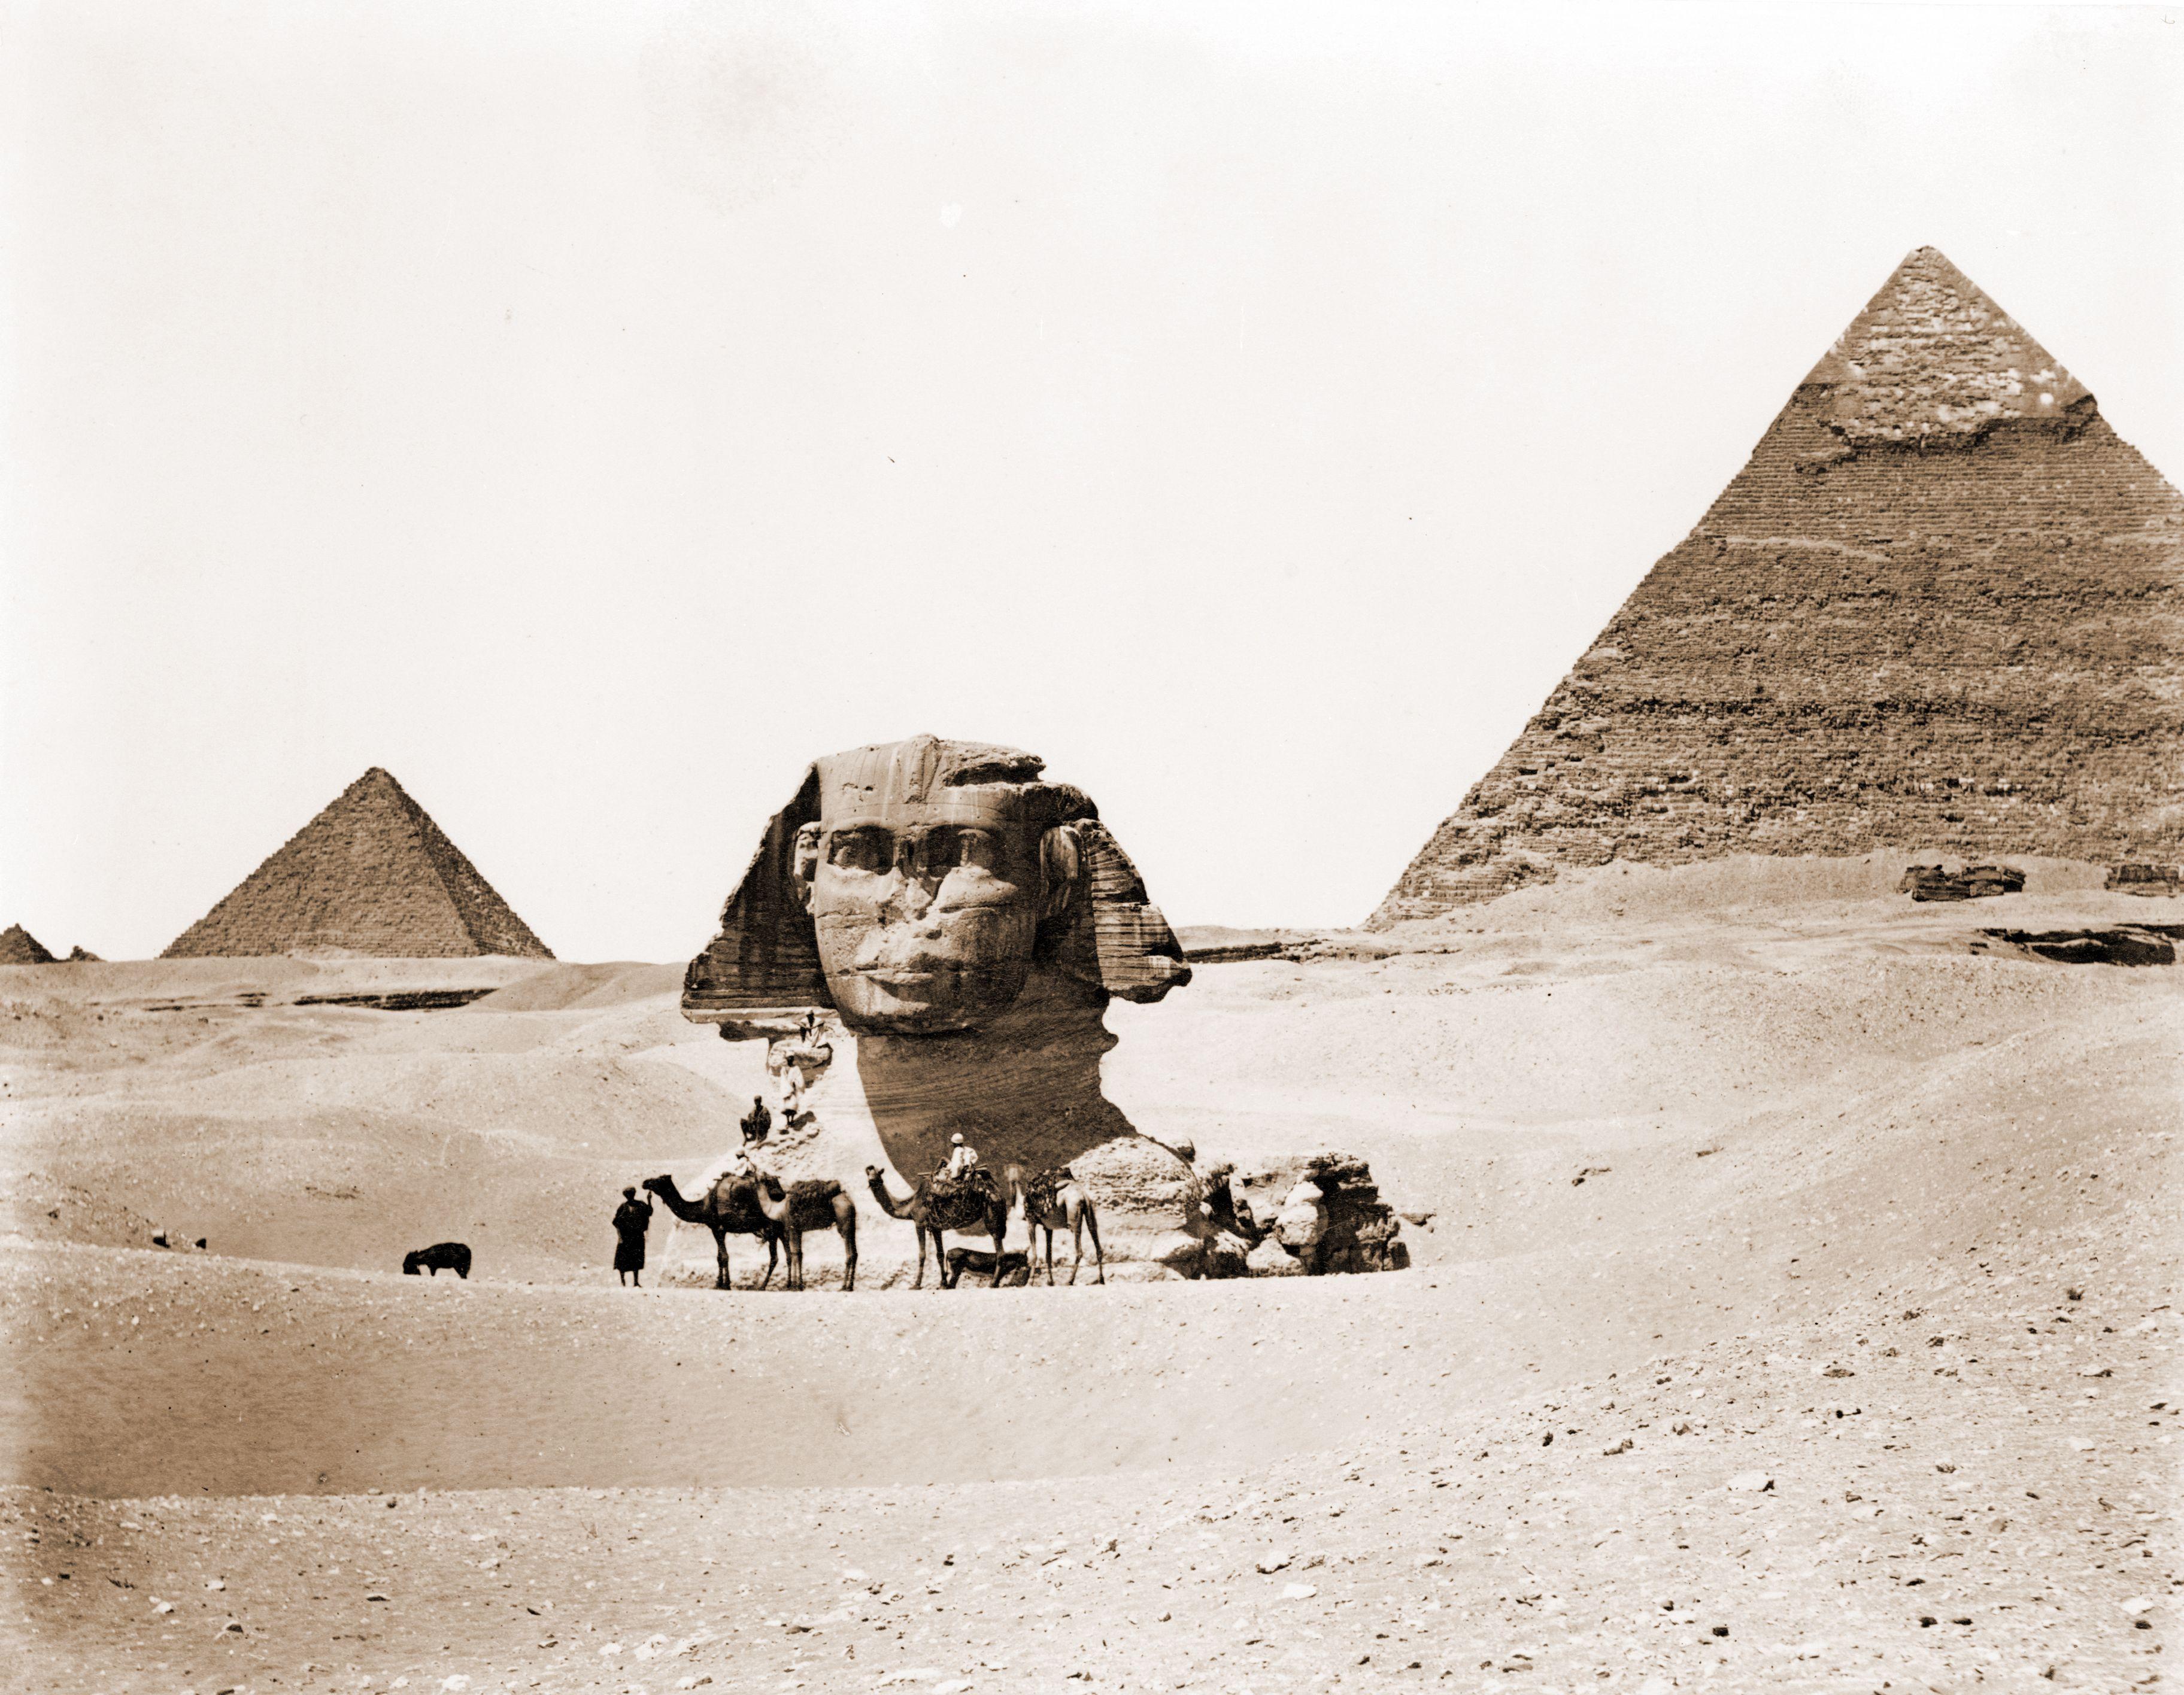 The Sphinx Egypt Egypt History Ancient Egypt